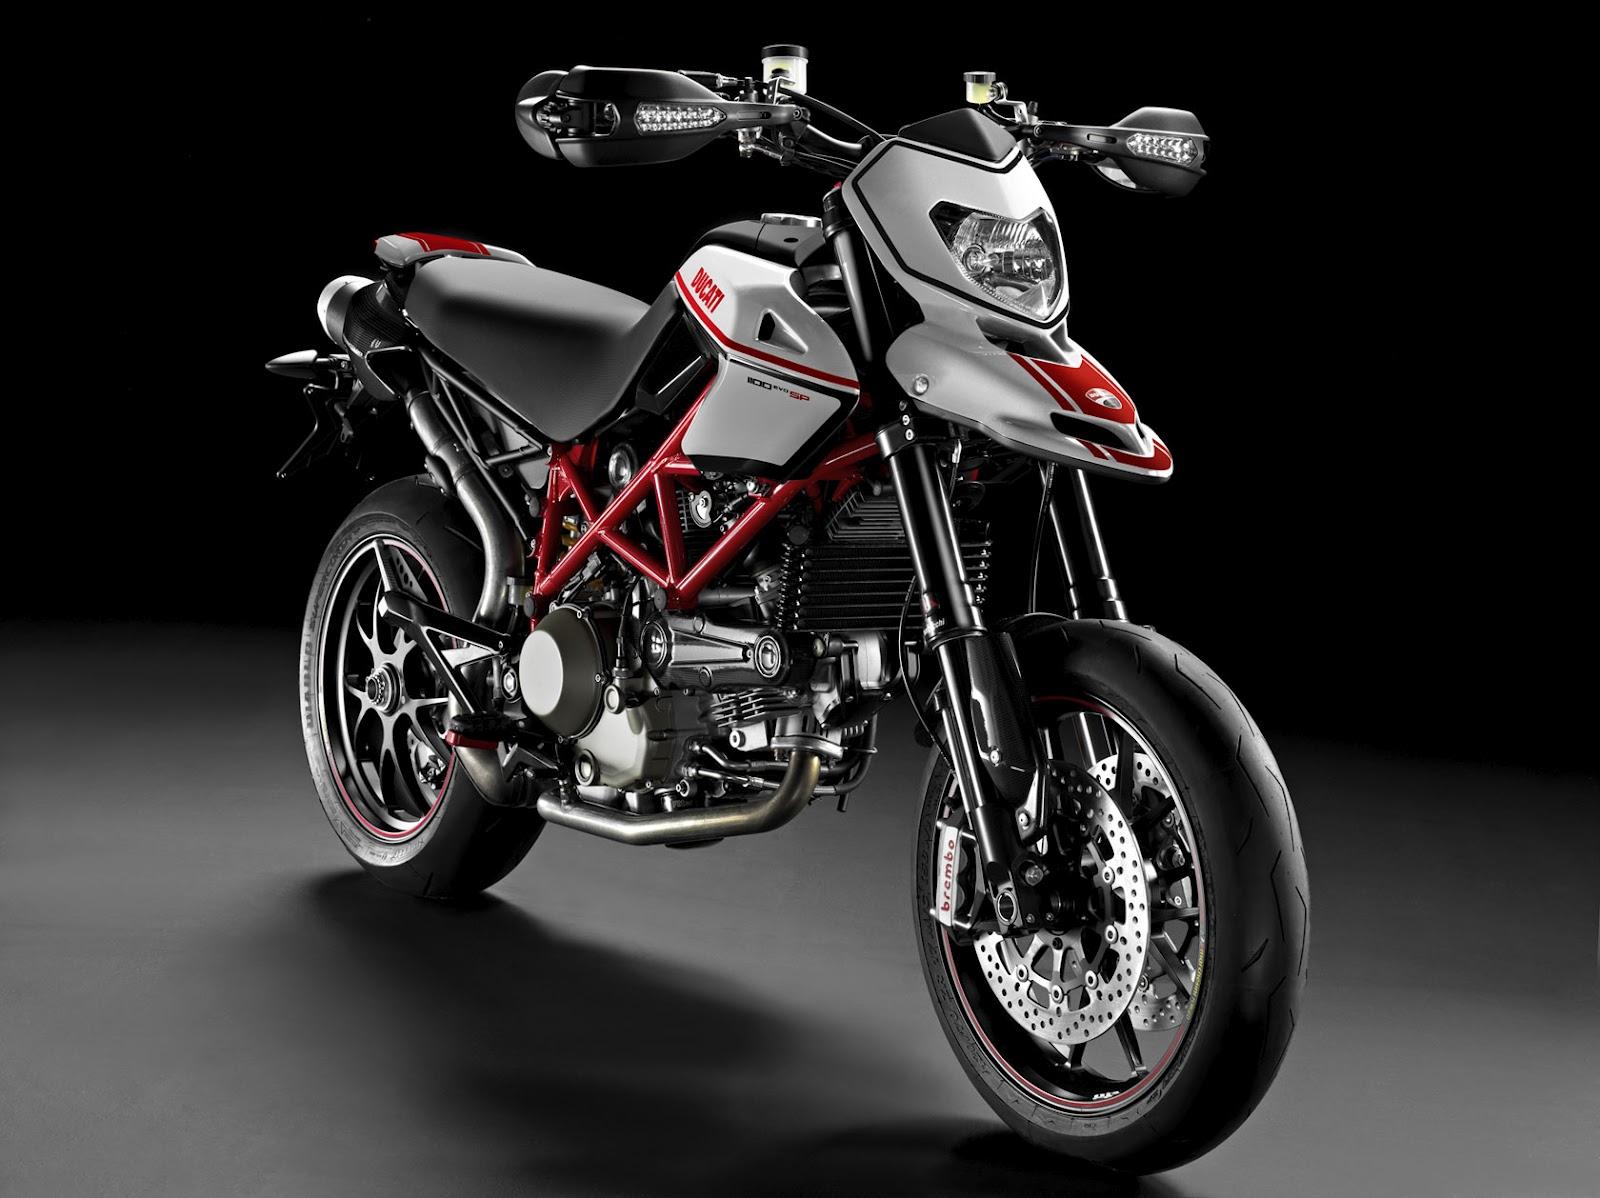 Ducai Manuals Resource  Ducati Hypermotard 1100 Evo Sp 2011 Spare Parts Catalogs